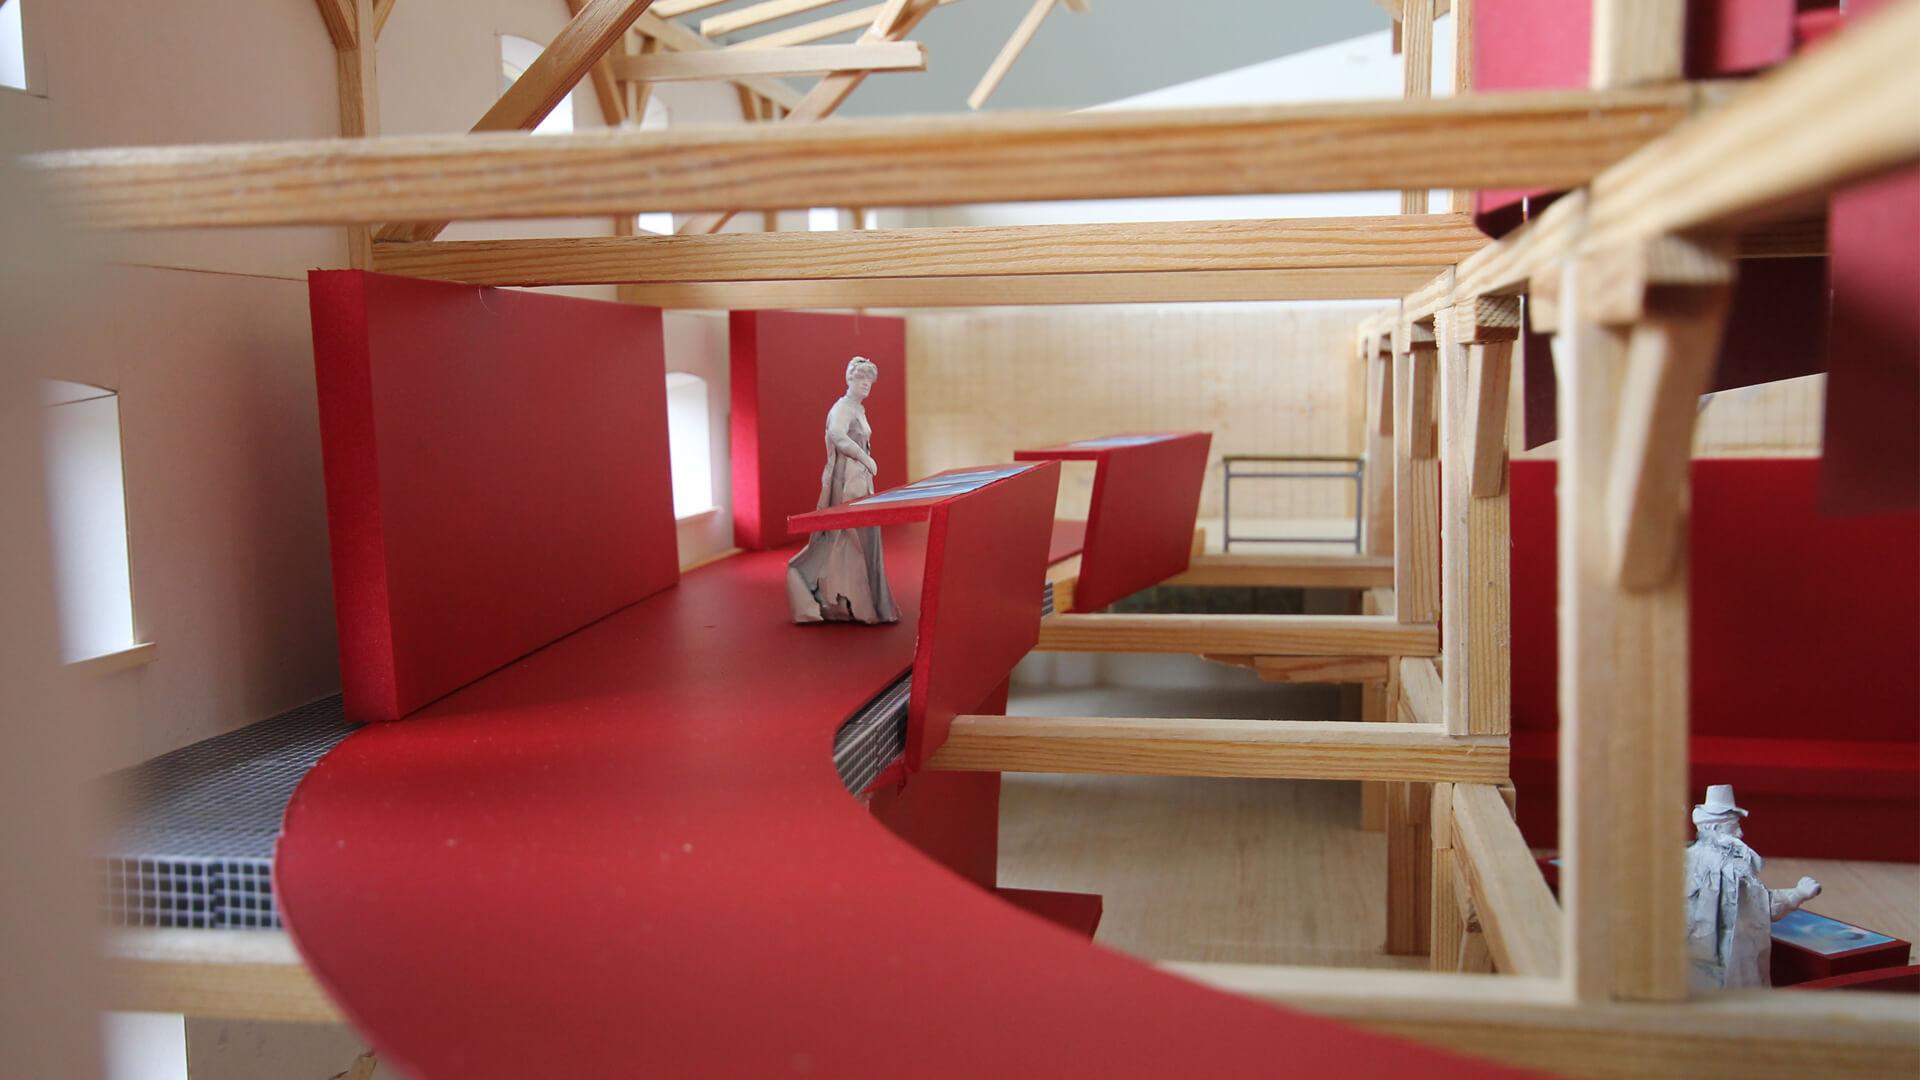 Stiegl-Brauwelt_museum-goes-interactive_03